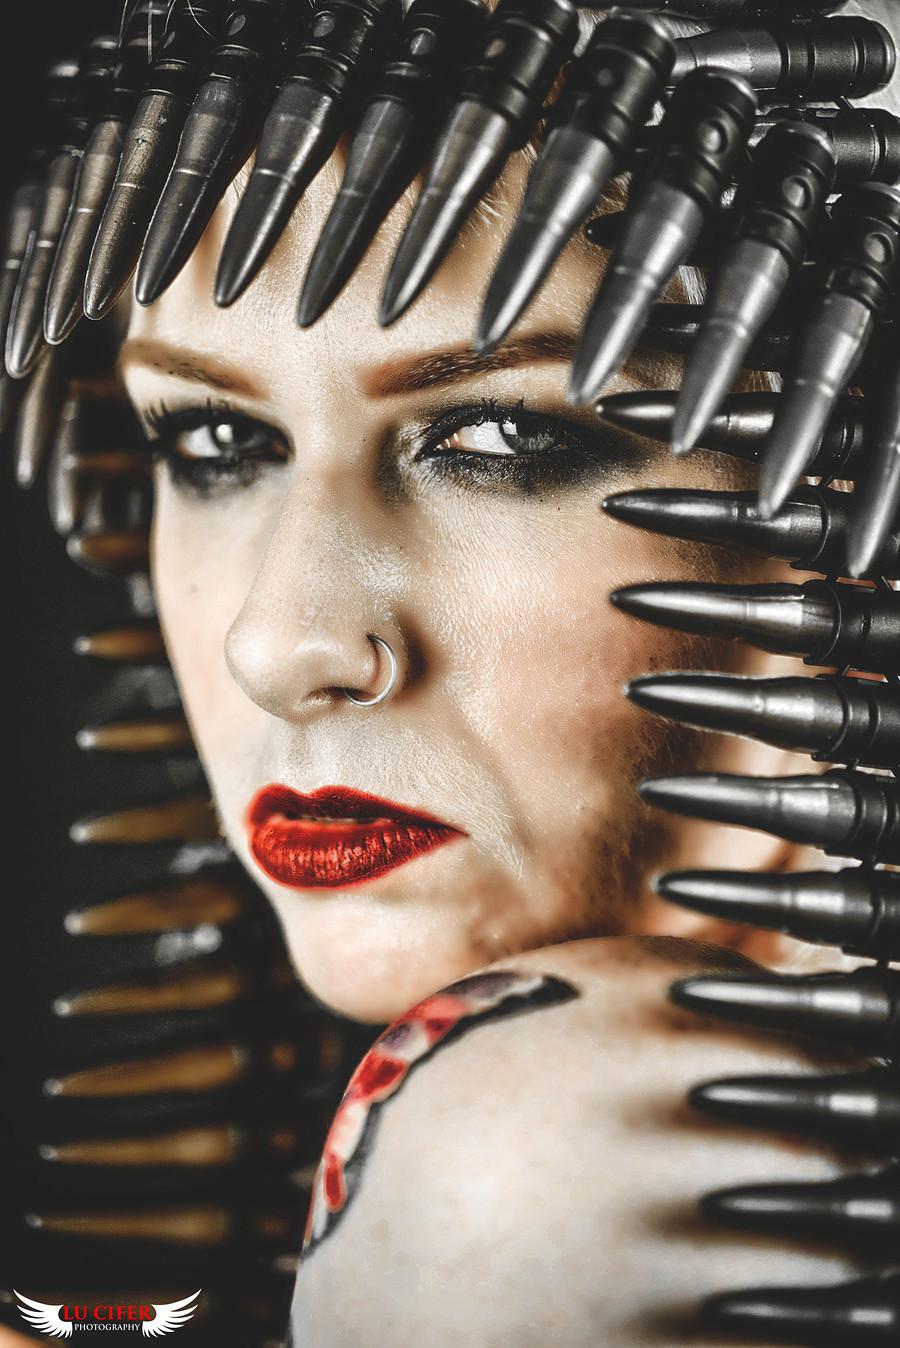 Photography by Lu Cifer Photography, Model Jocey, Makeup by Jocey / Uploaded 31st October 2016 @ 10:27 PM